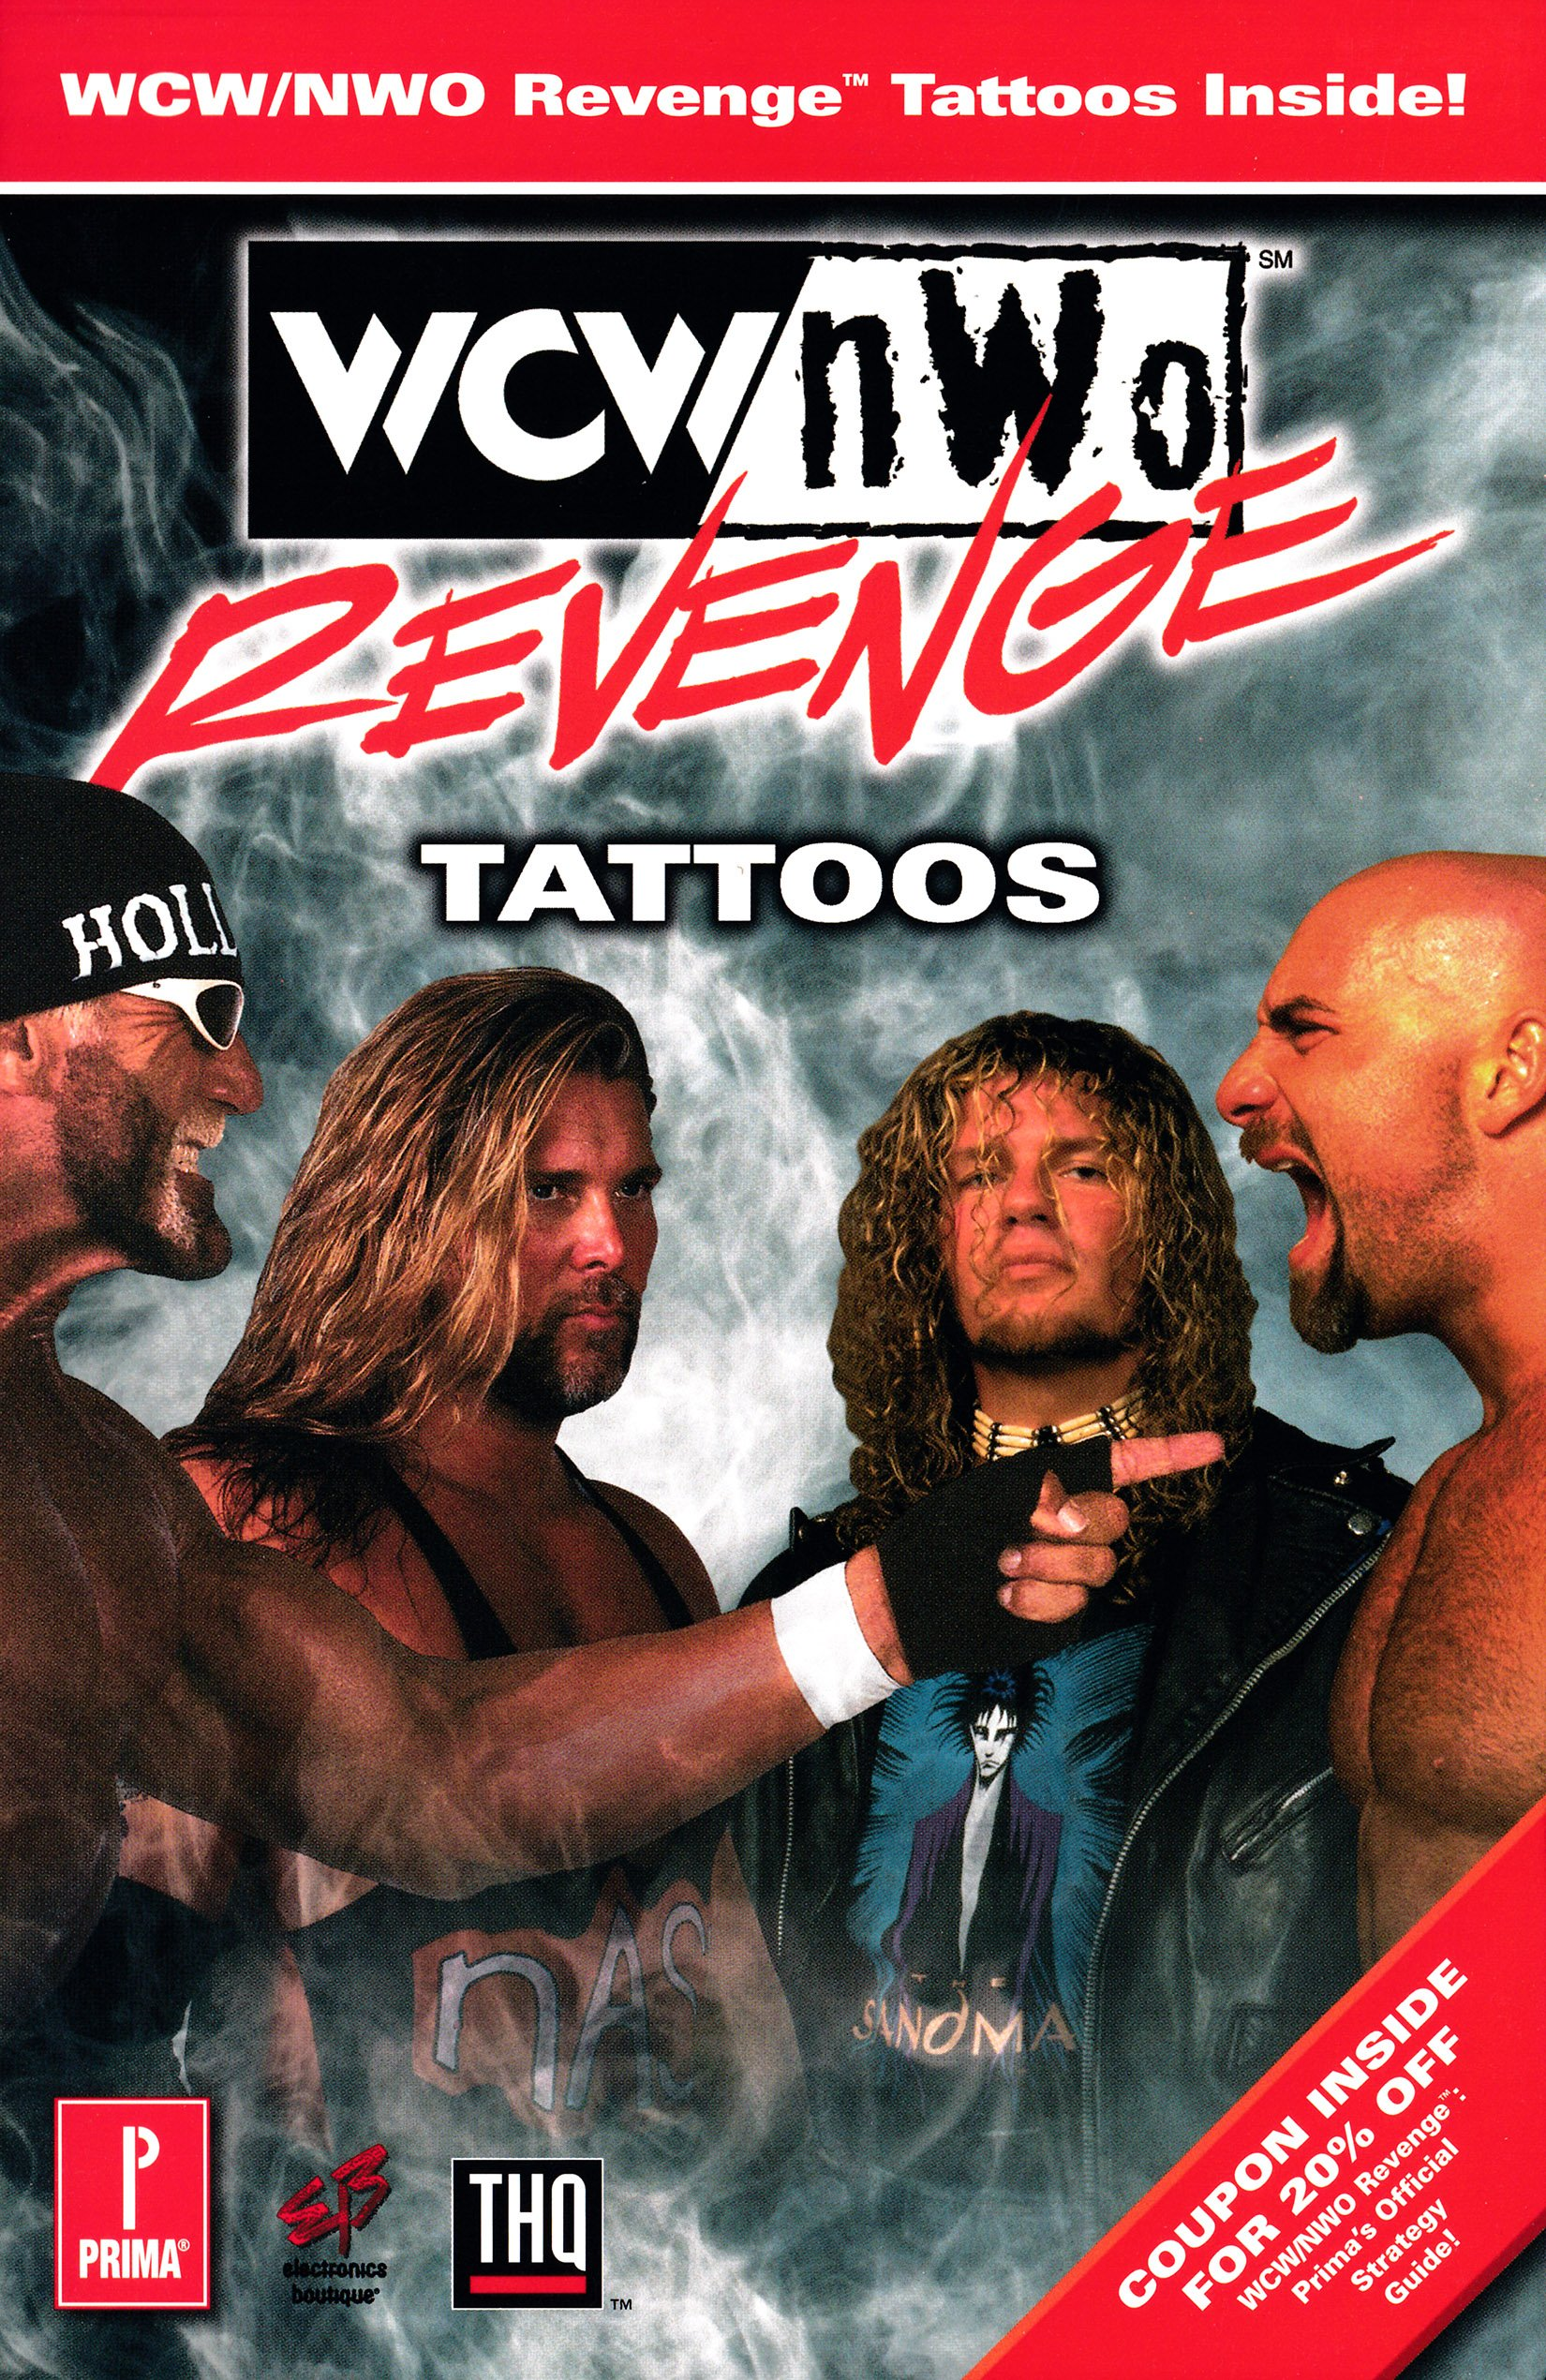 WCW-nWo Revenge Tattoos